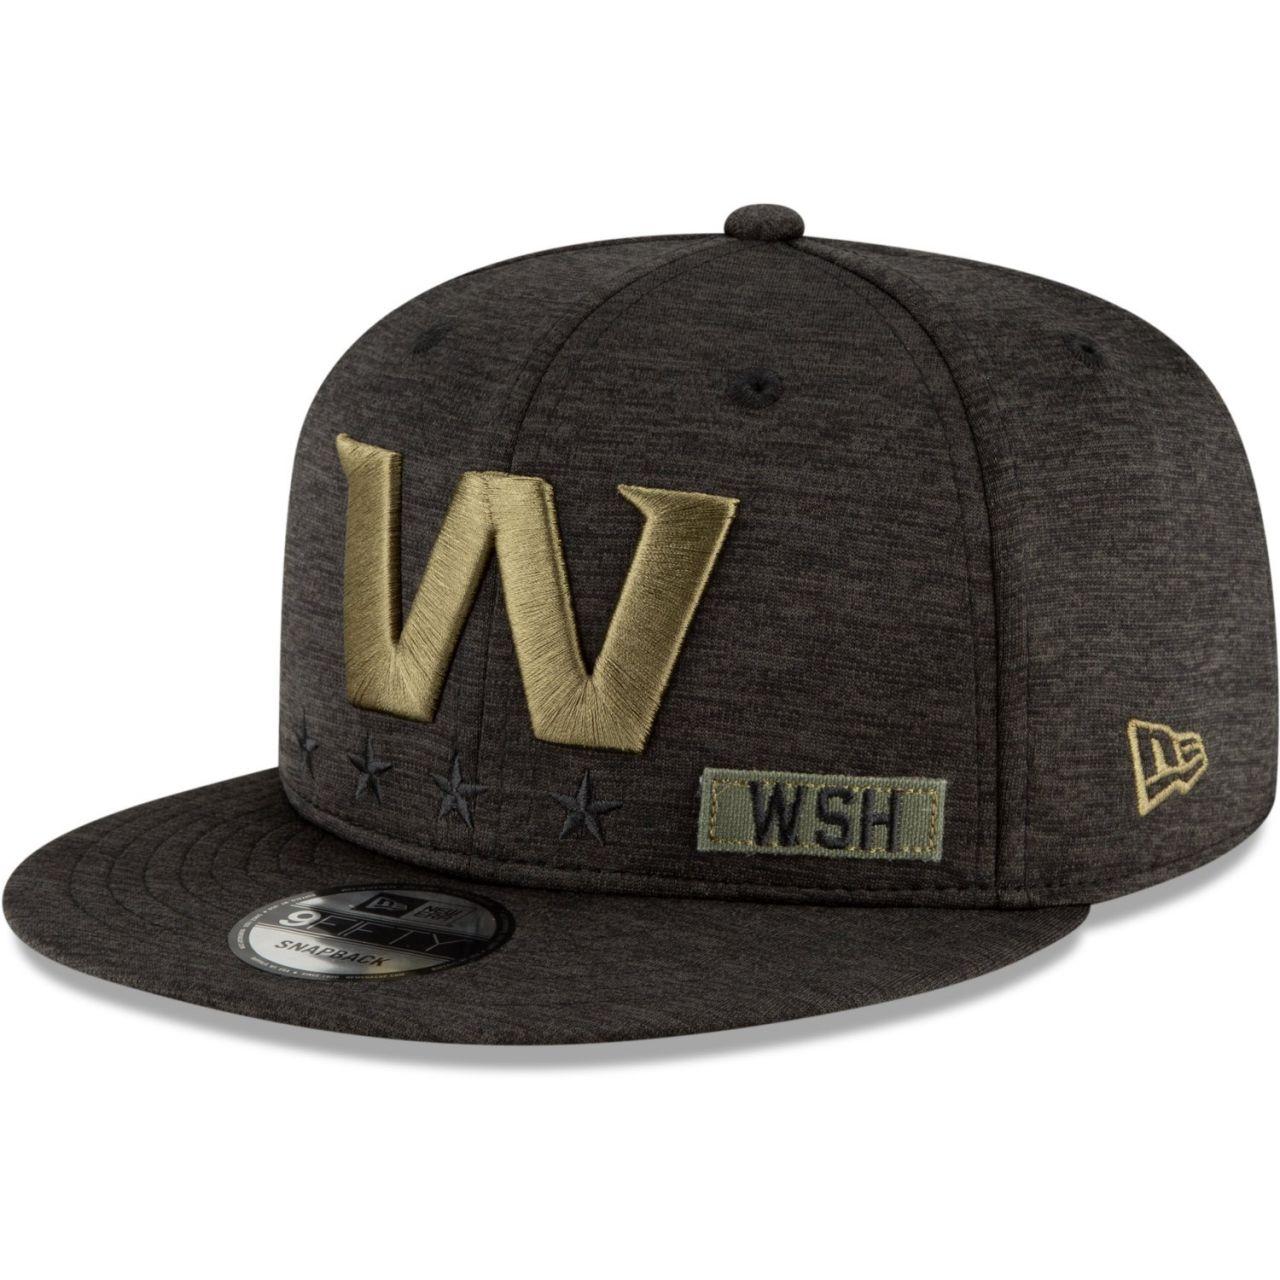 amfoo - New Era 9FIFTY Cap Salute to Service Washington Team